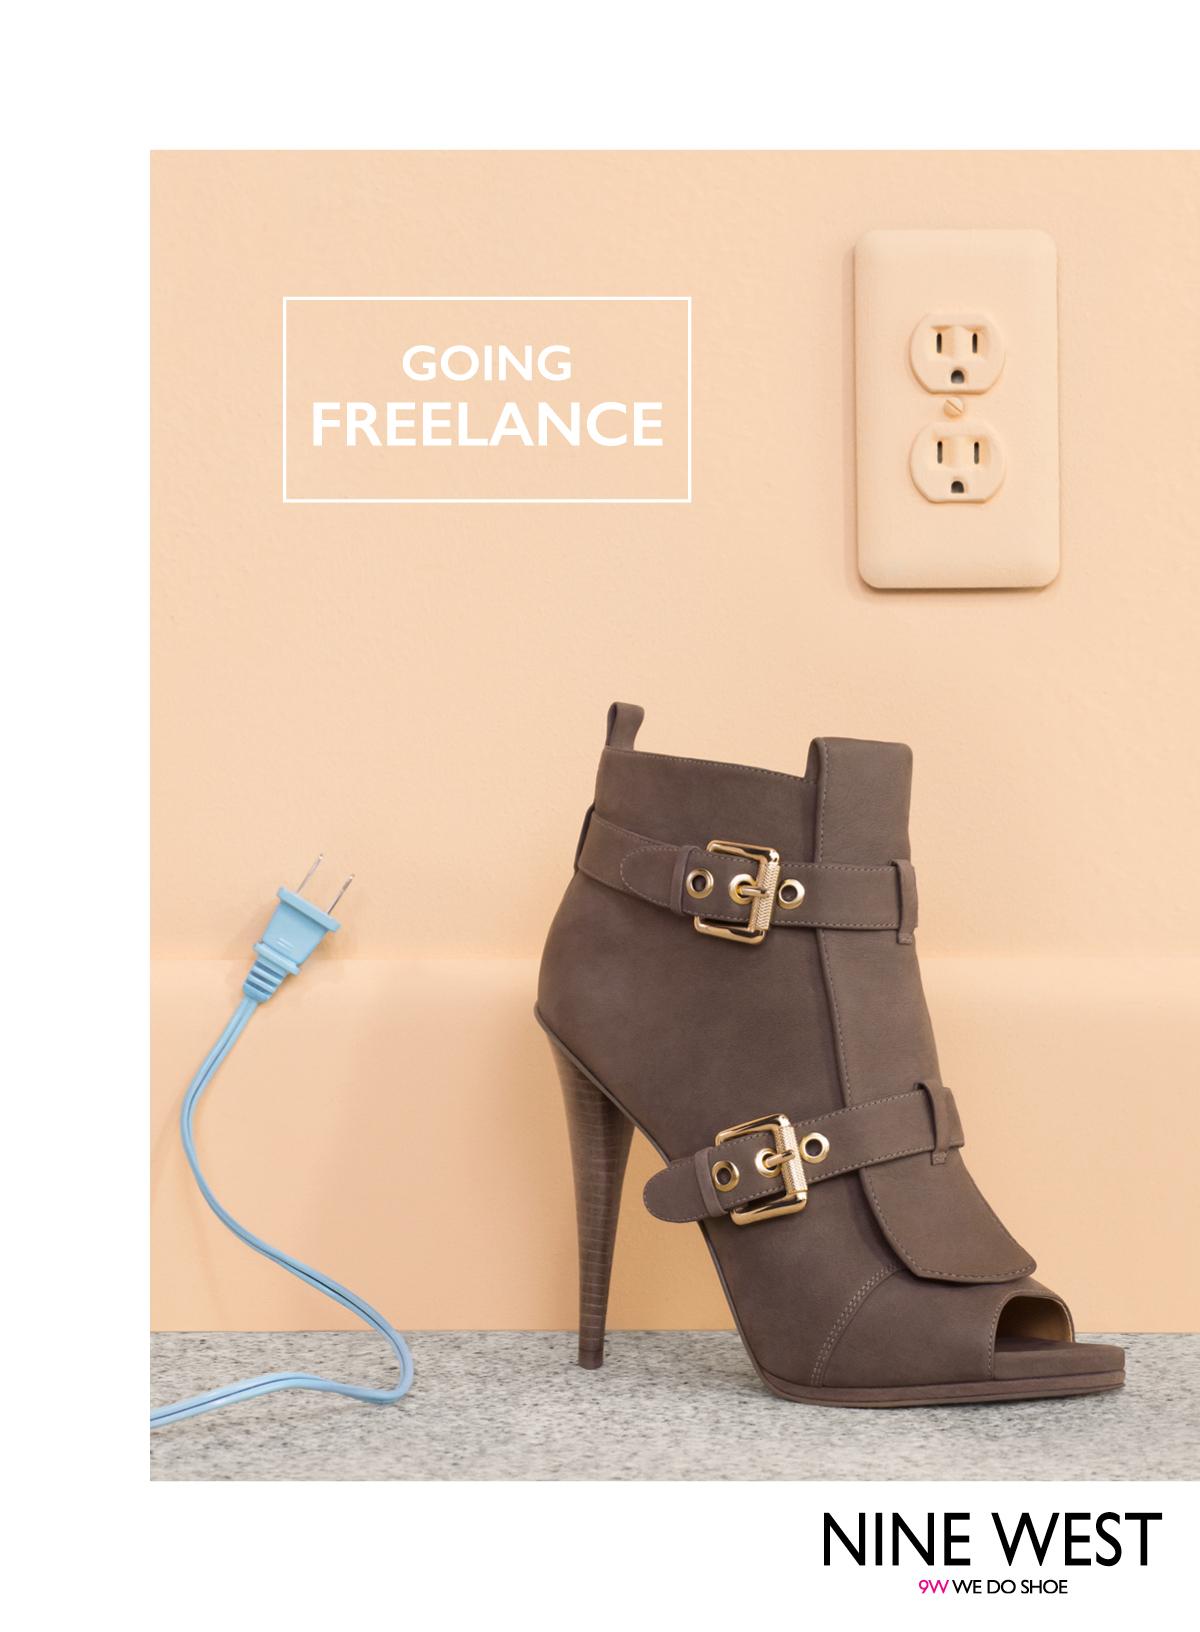 NWS_Fall14_Freelance_Product.jpg